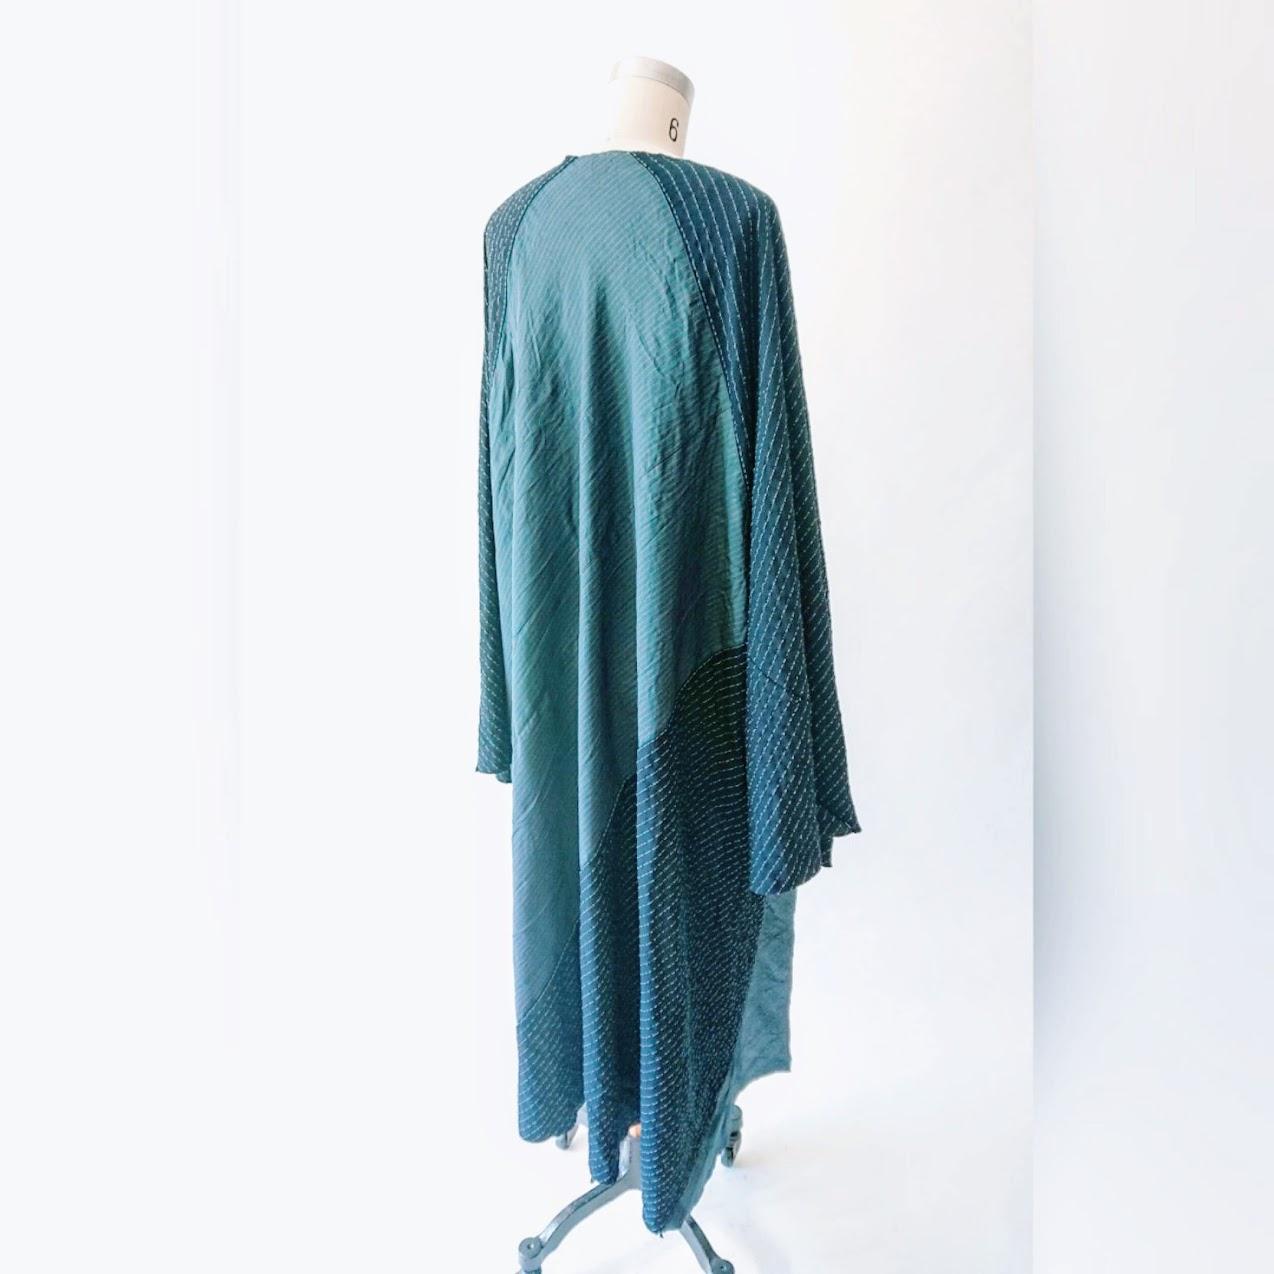 House Coat